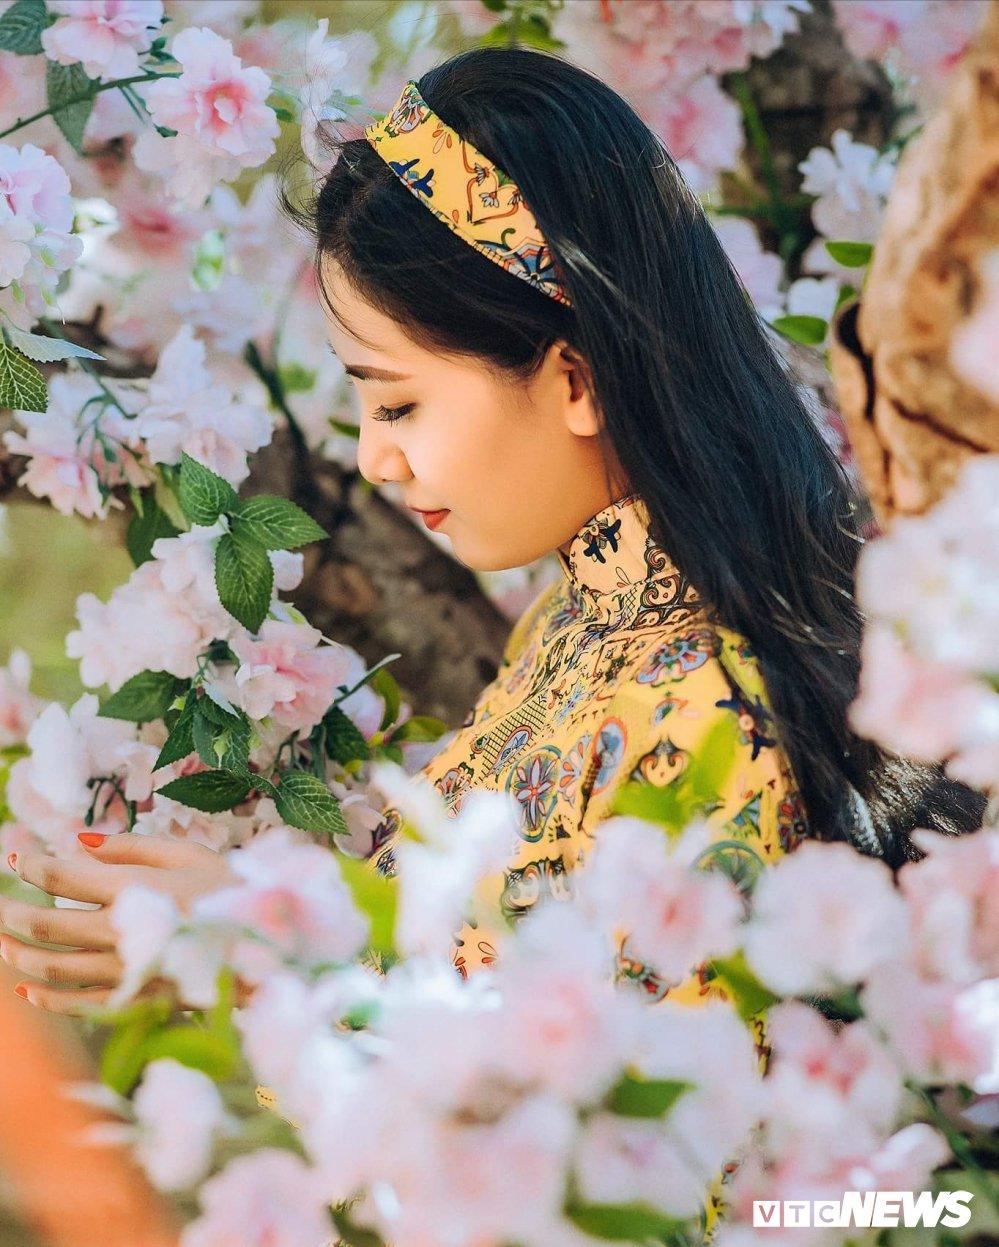 Hot girl Sai thanh khoe sac ben hoa mai hinh anh 3